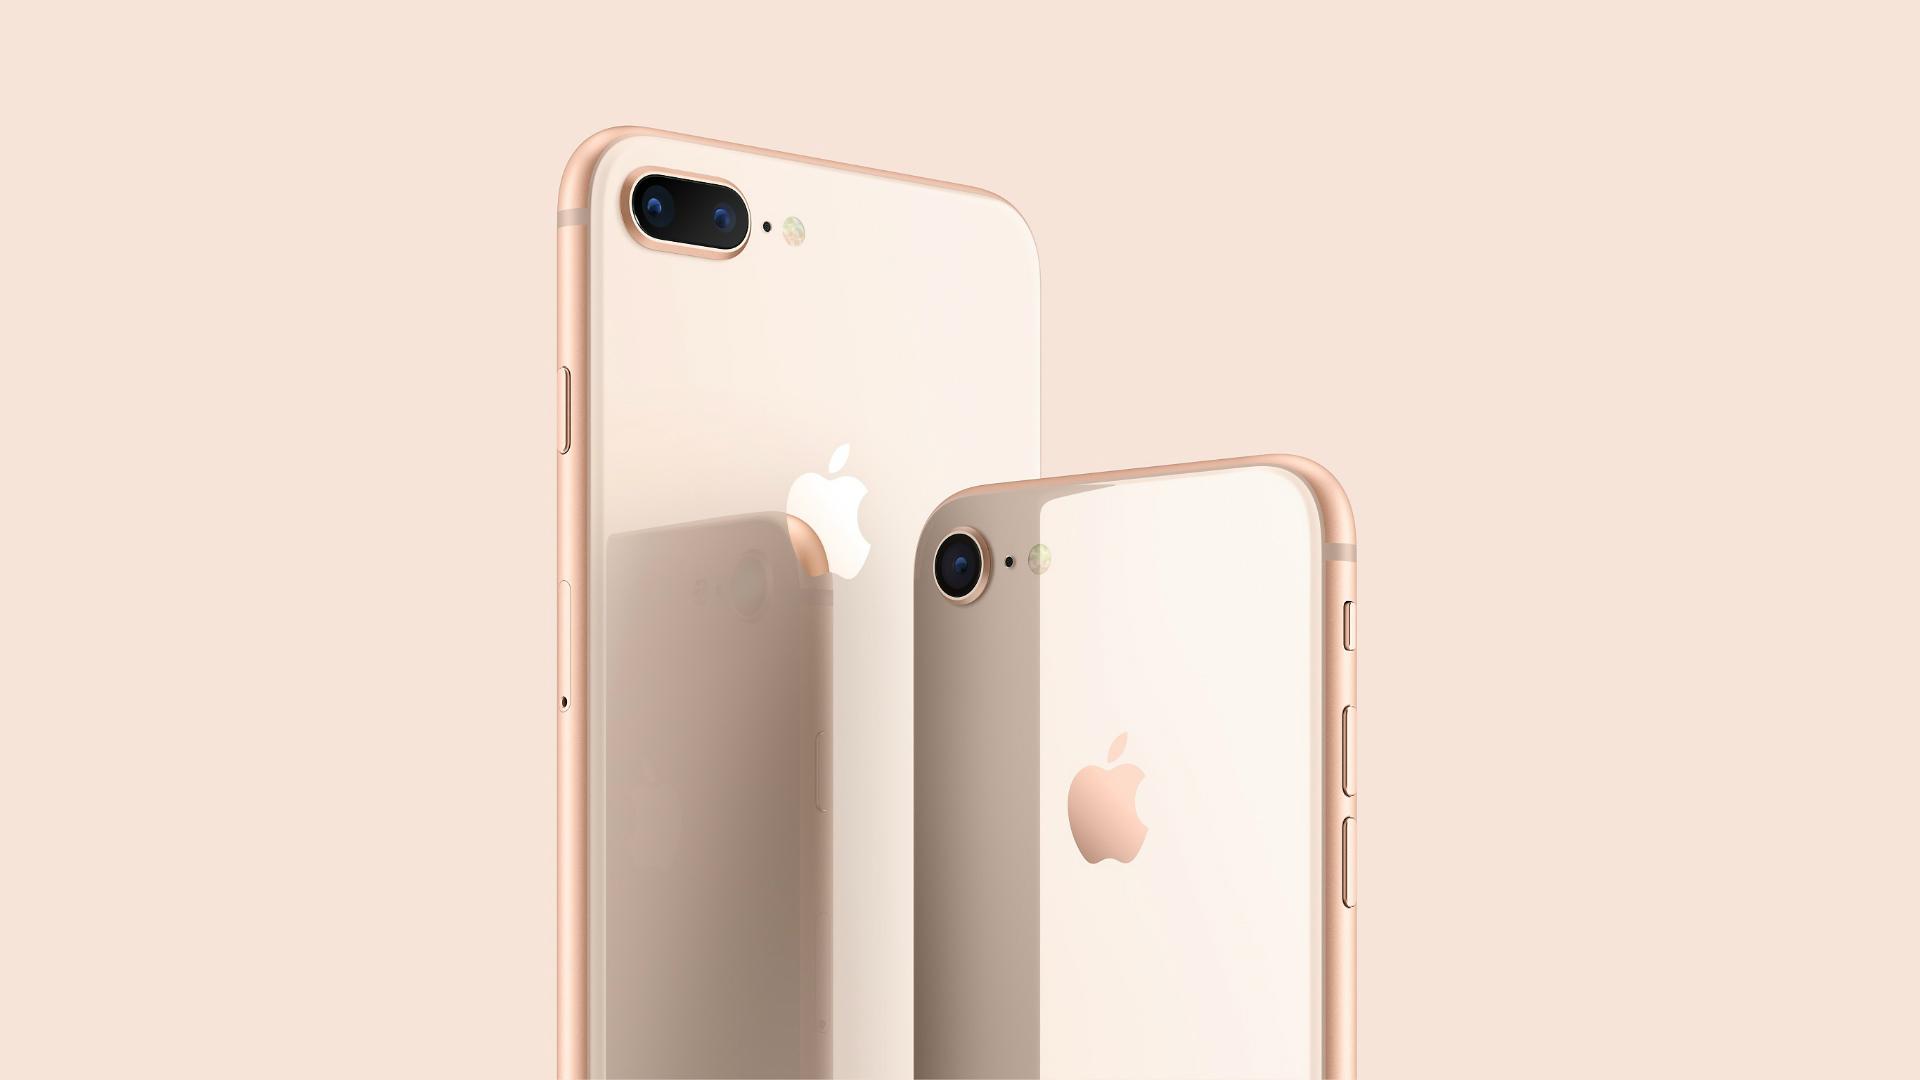 Apple iPhone 8 press render